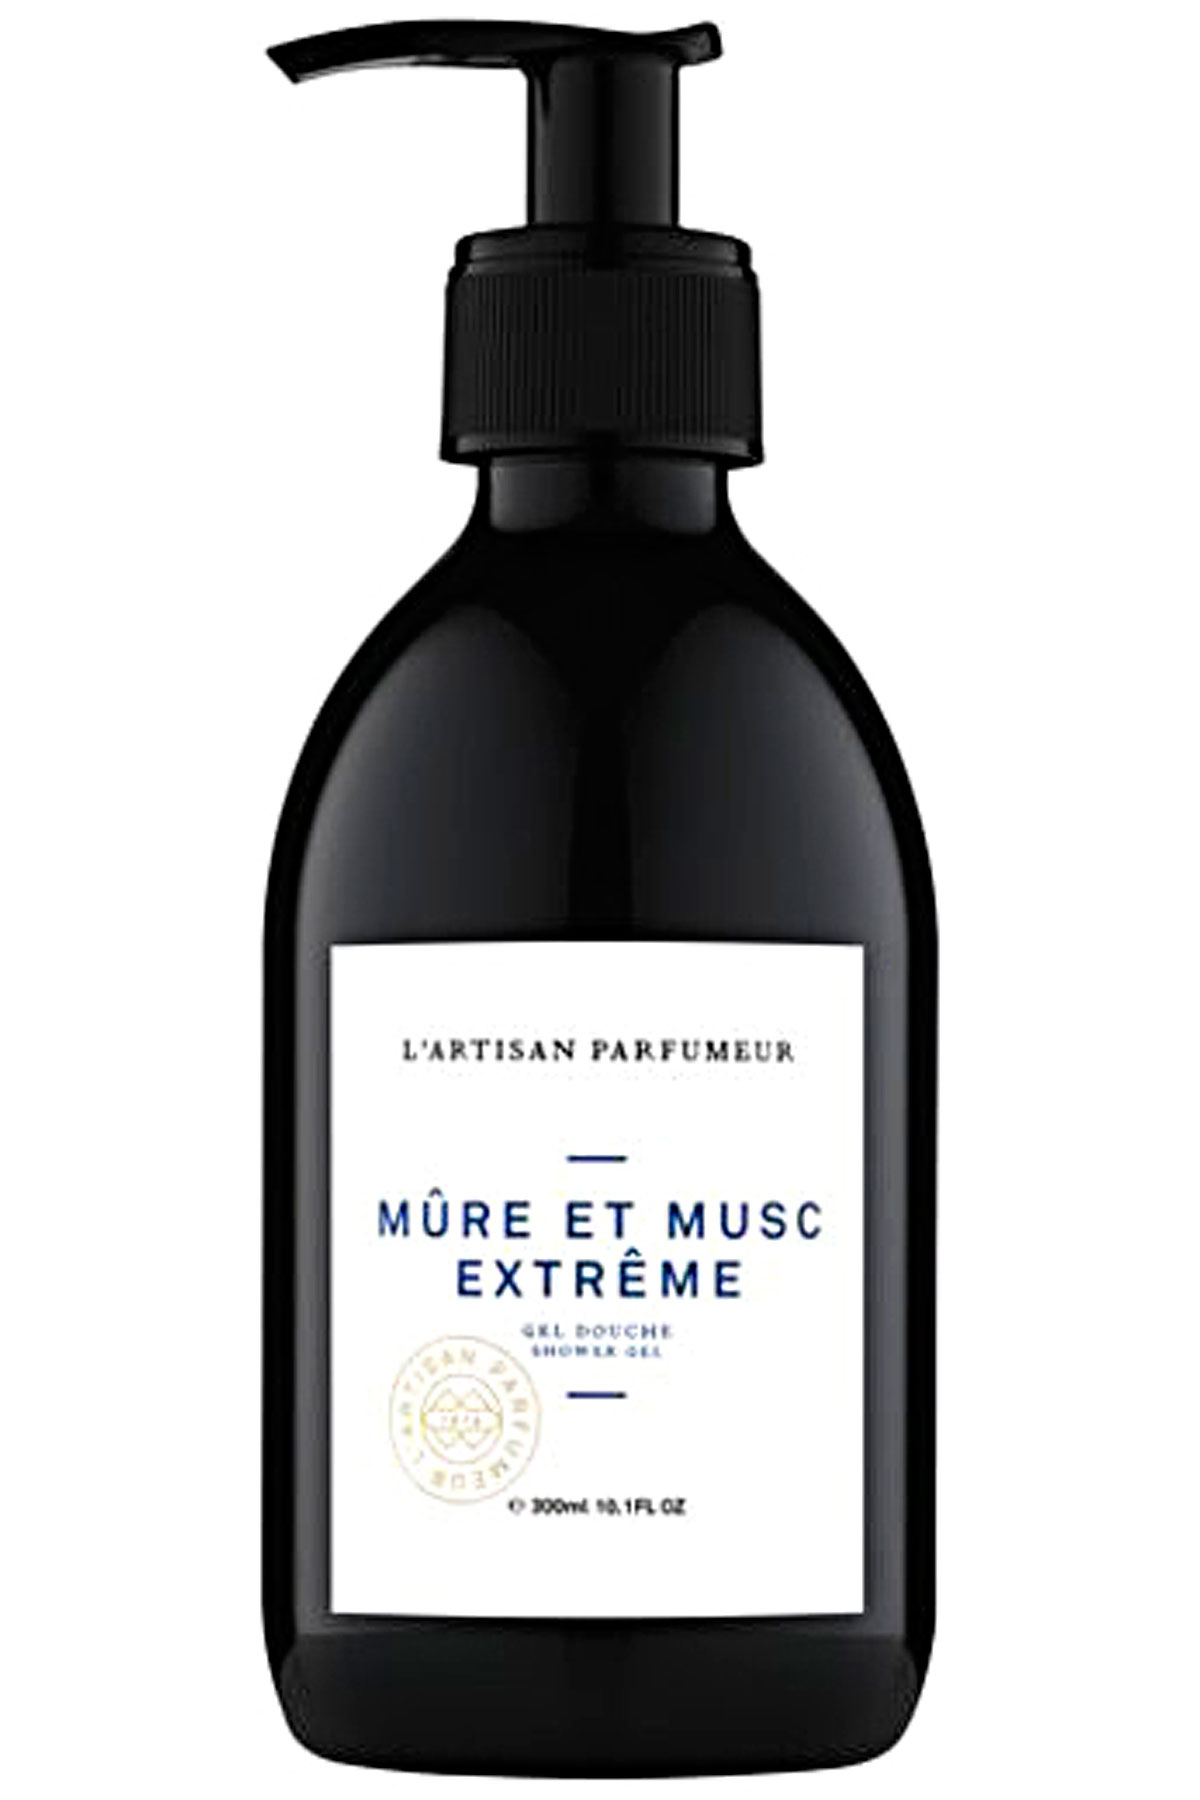 Artisan Parfumeur Beauty for Women, Mure Et Musc Extreme - Shower Gel - 300 Ml, 2019, 300 ml